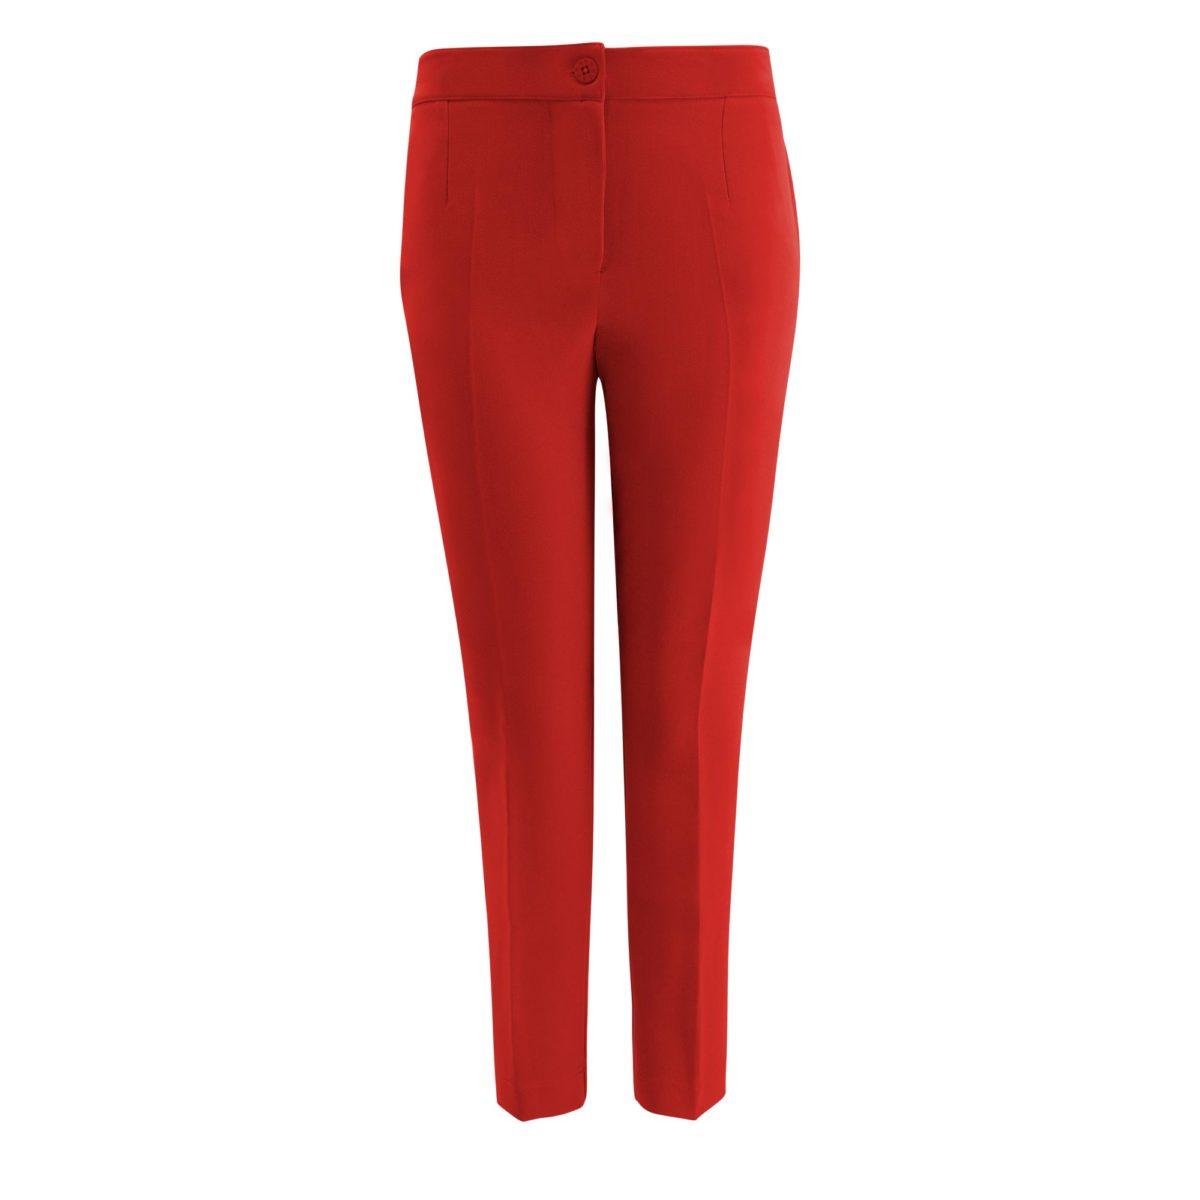 Pantalone Straight Rosso - vista frontale | Nicla